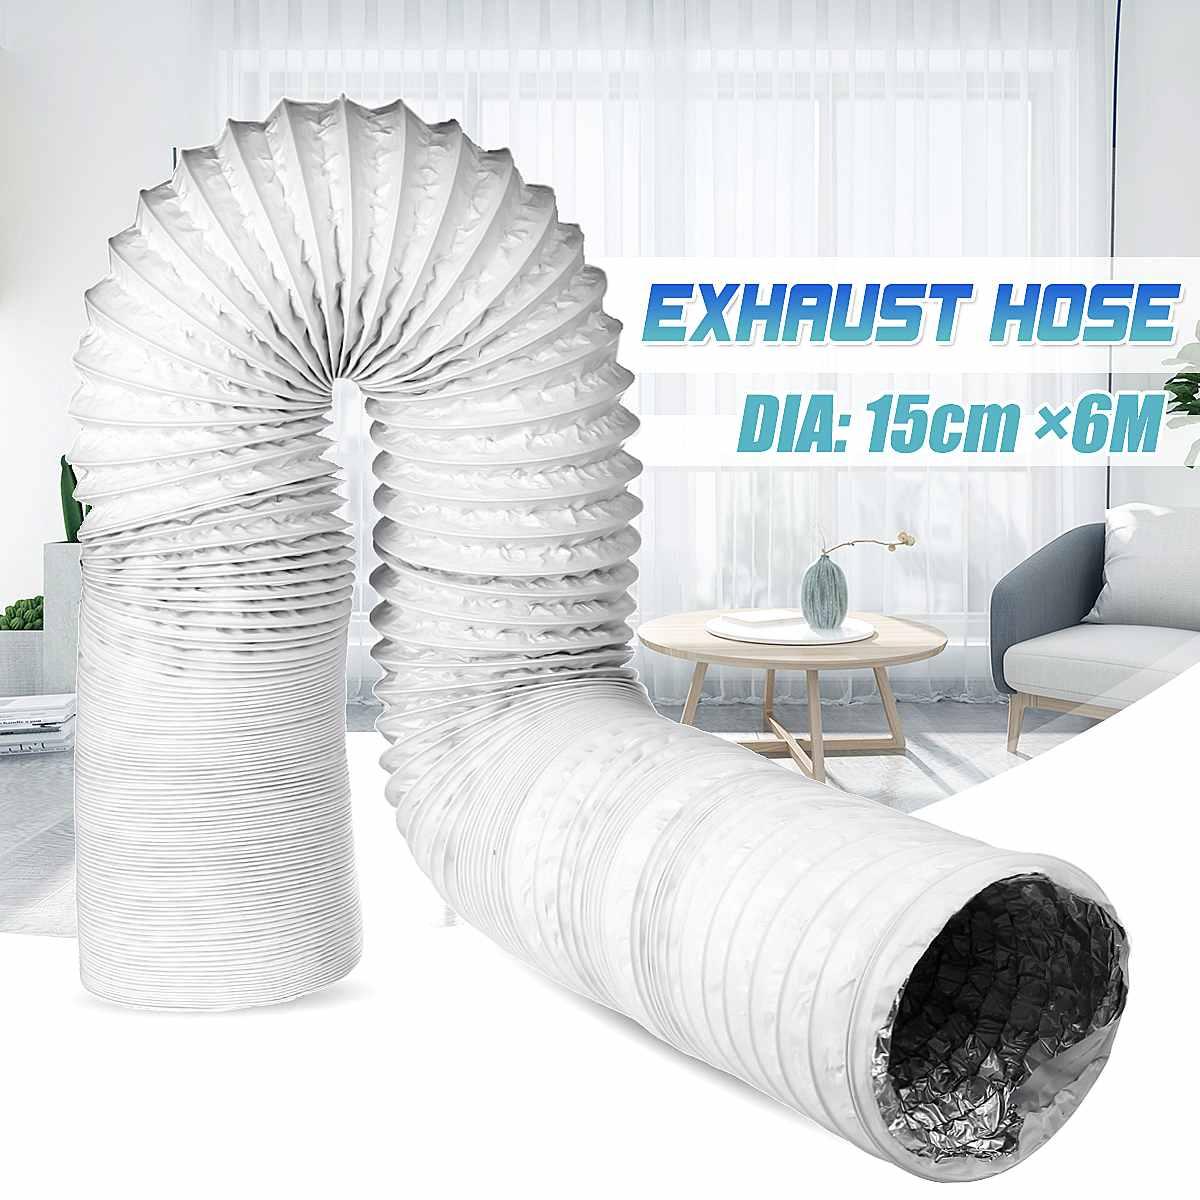 6 Inch  Double Aluminum Foil Tube Ventilation  Conditioner Duct Pipe Exhaust Hose Vent  For Kitchen Toilet Inline Exhaust Fan